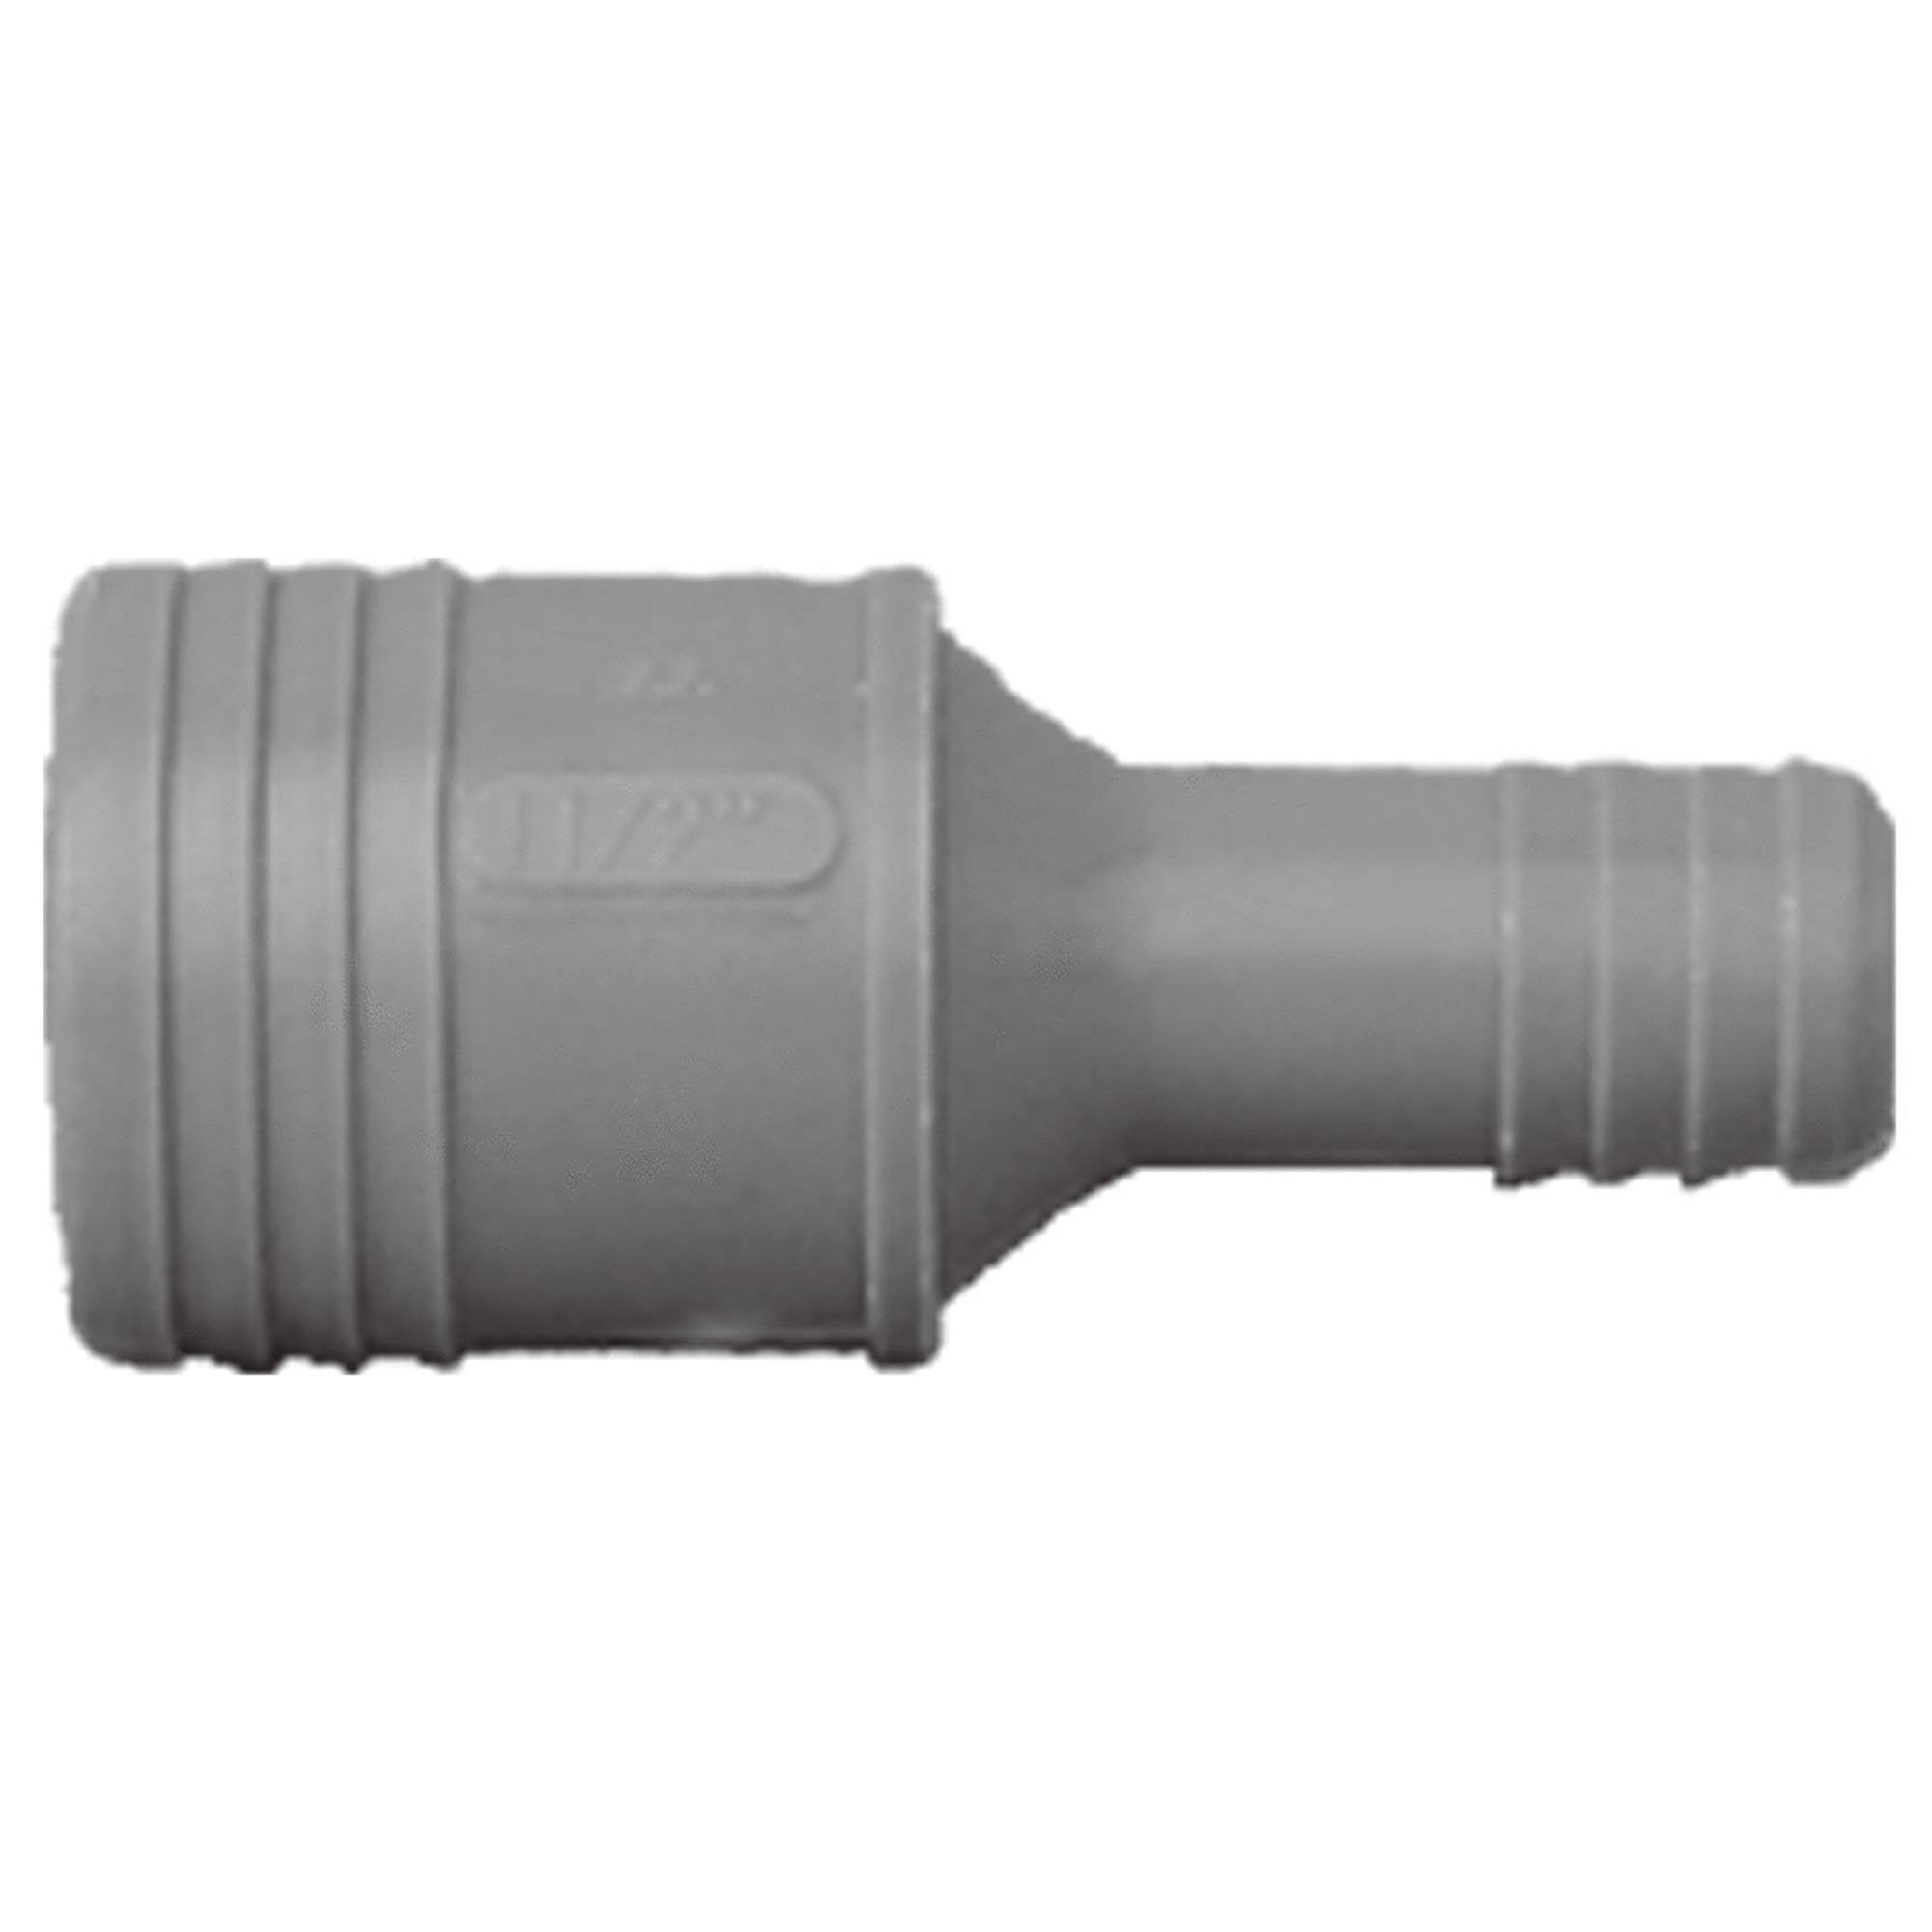 KYOCERA 226L-0433L400 Series 226 Left Hand Micro Drill Bit AlTiN 38 mm Length 2 Flutes 10.20 mm Cutting Length Carbide 1.10 mm Cutting Diameter 130 Degree Cutting Angle 3 mm Shank Diameter